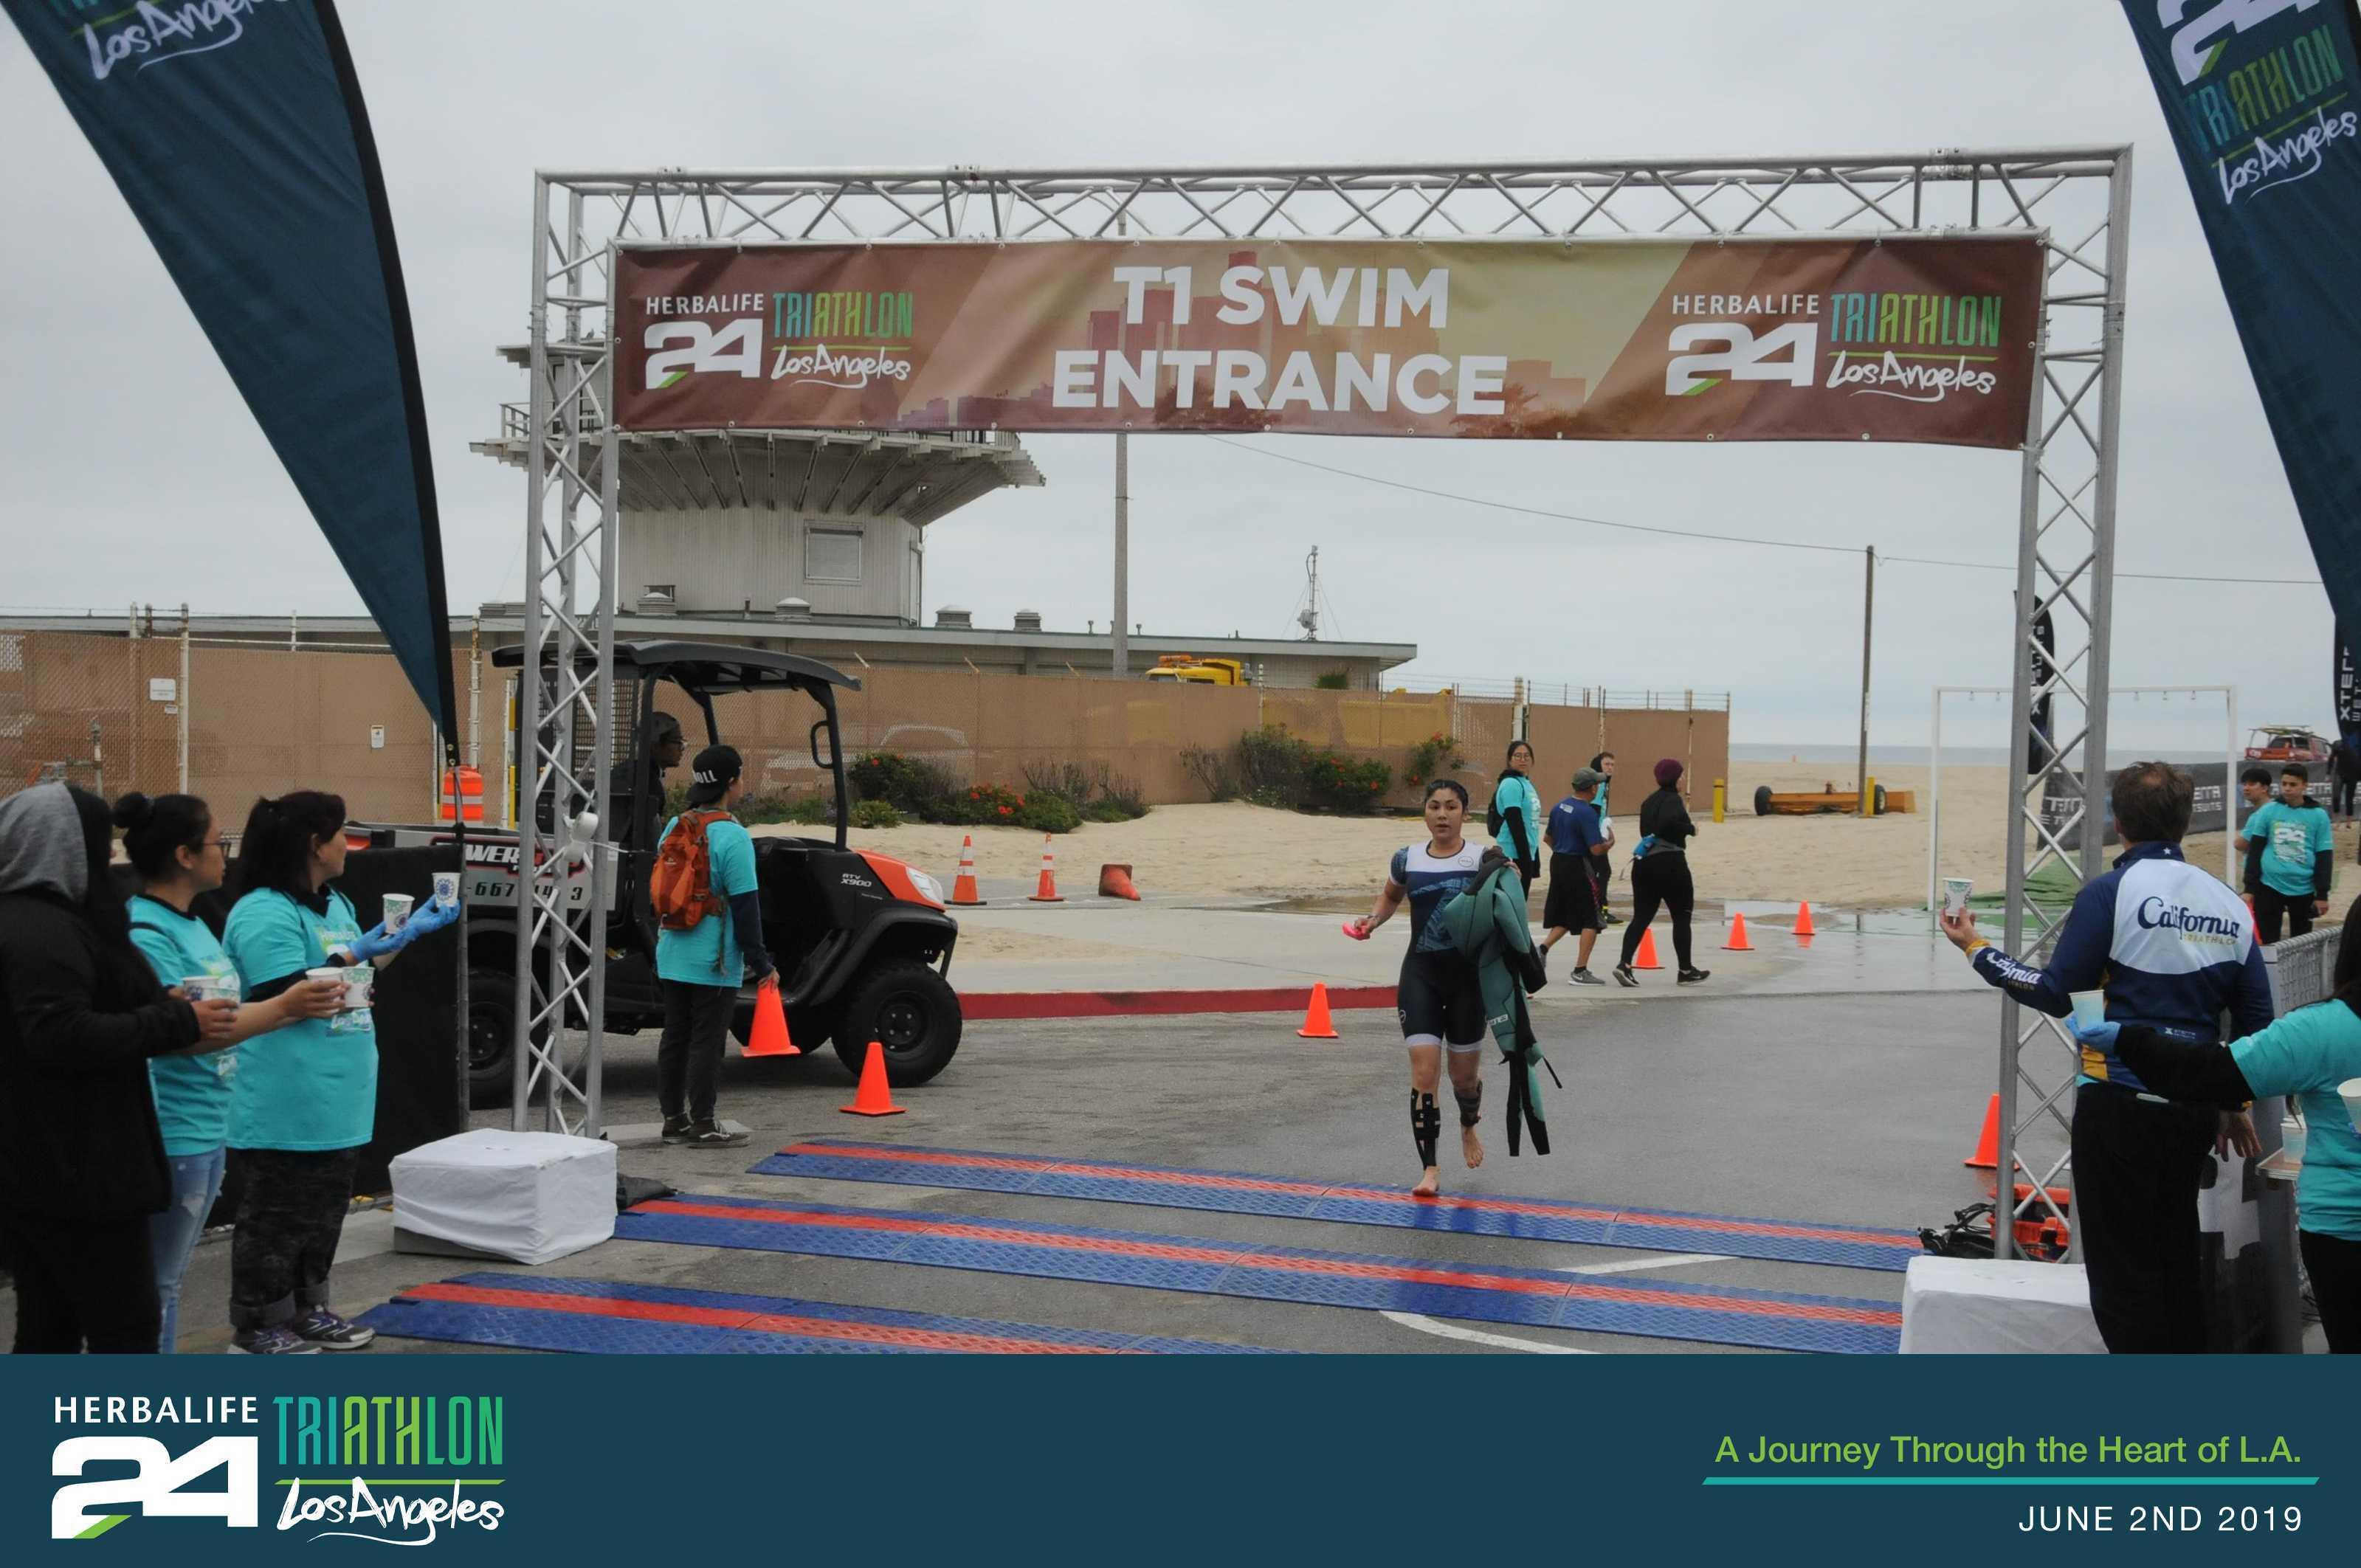 Race Spotlight: Herbalife24 Triathlon Los Angeles   LATF USA